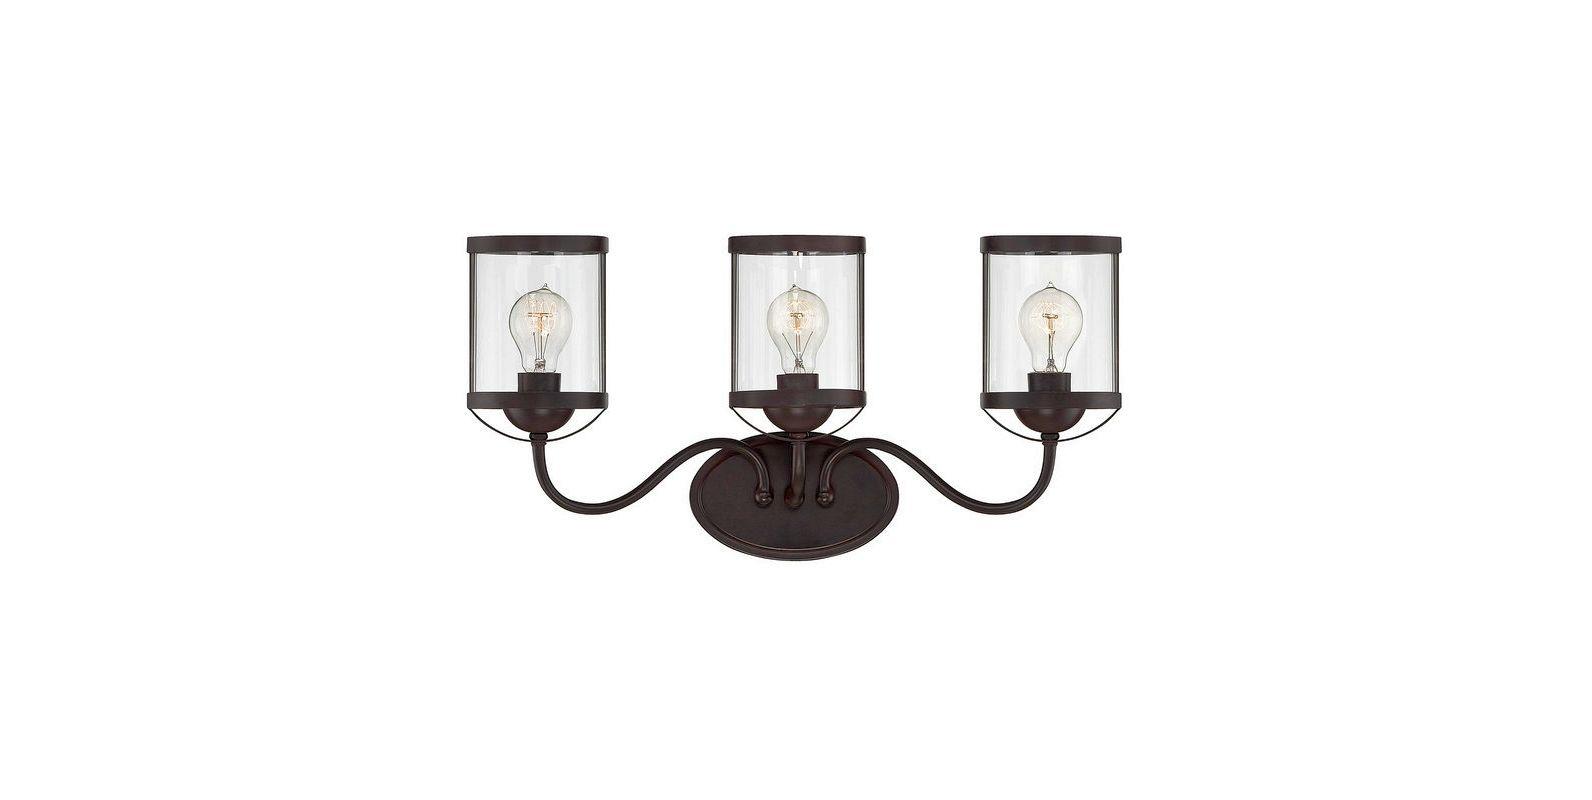 "Savoy House 8-235-3 Bergen 24.5"" Wide 3 Light Bathroom Vanity Light Sale $270.00 ITEM#: 2602721 MODEL# :8-235-3-13 UPC#: 822920247934 :"